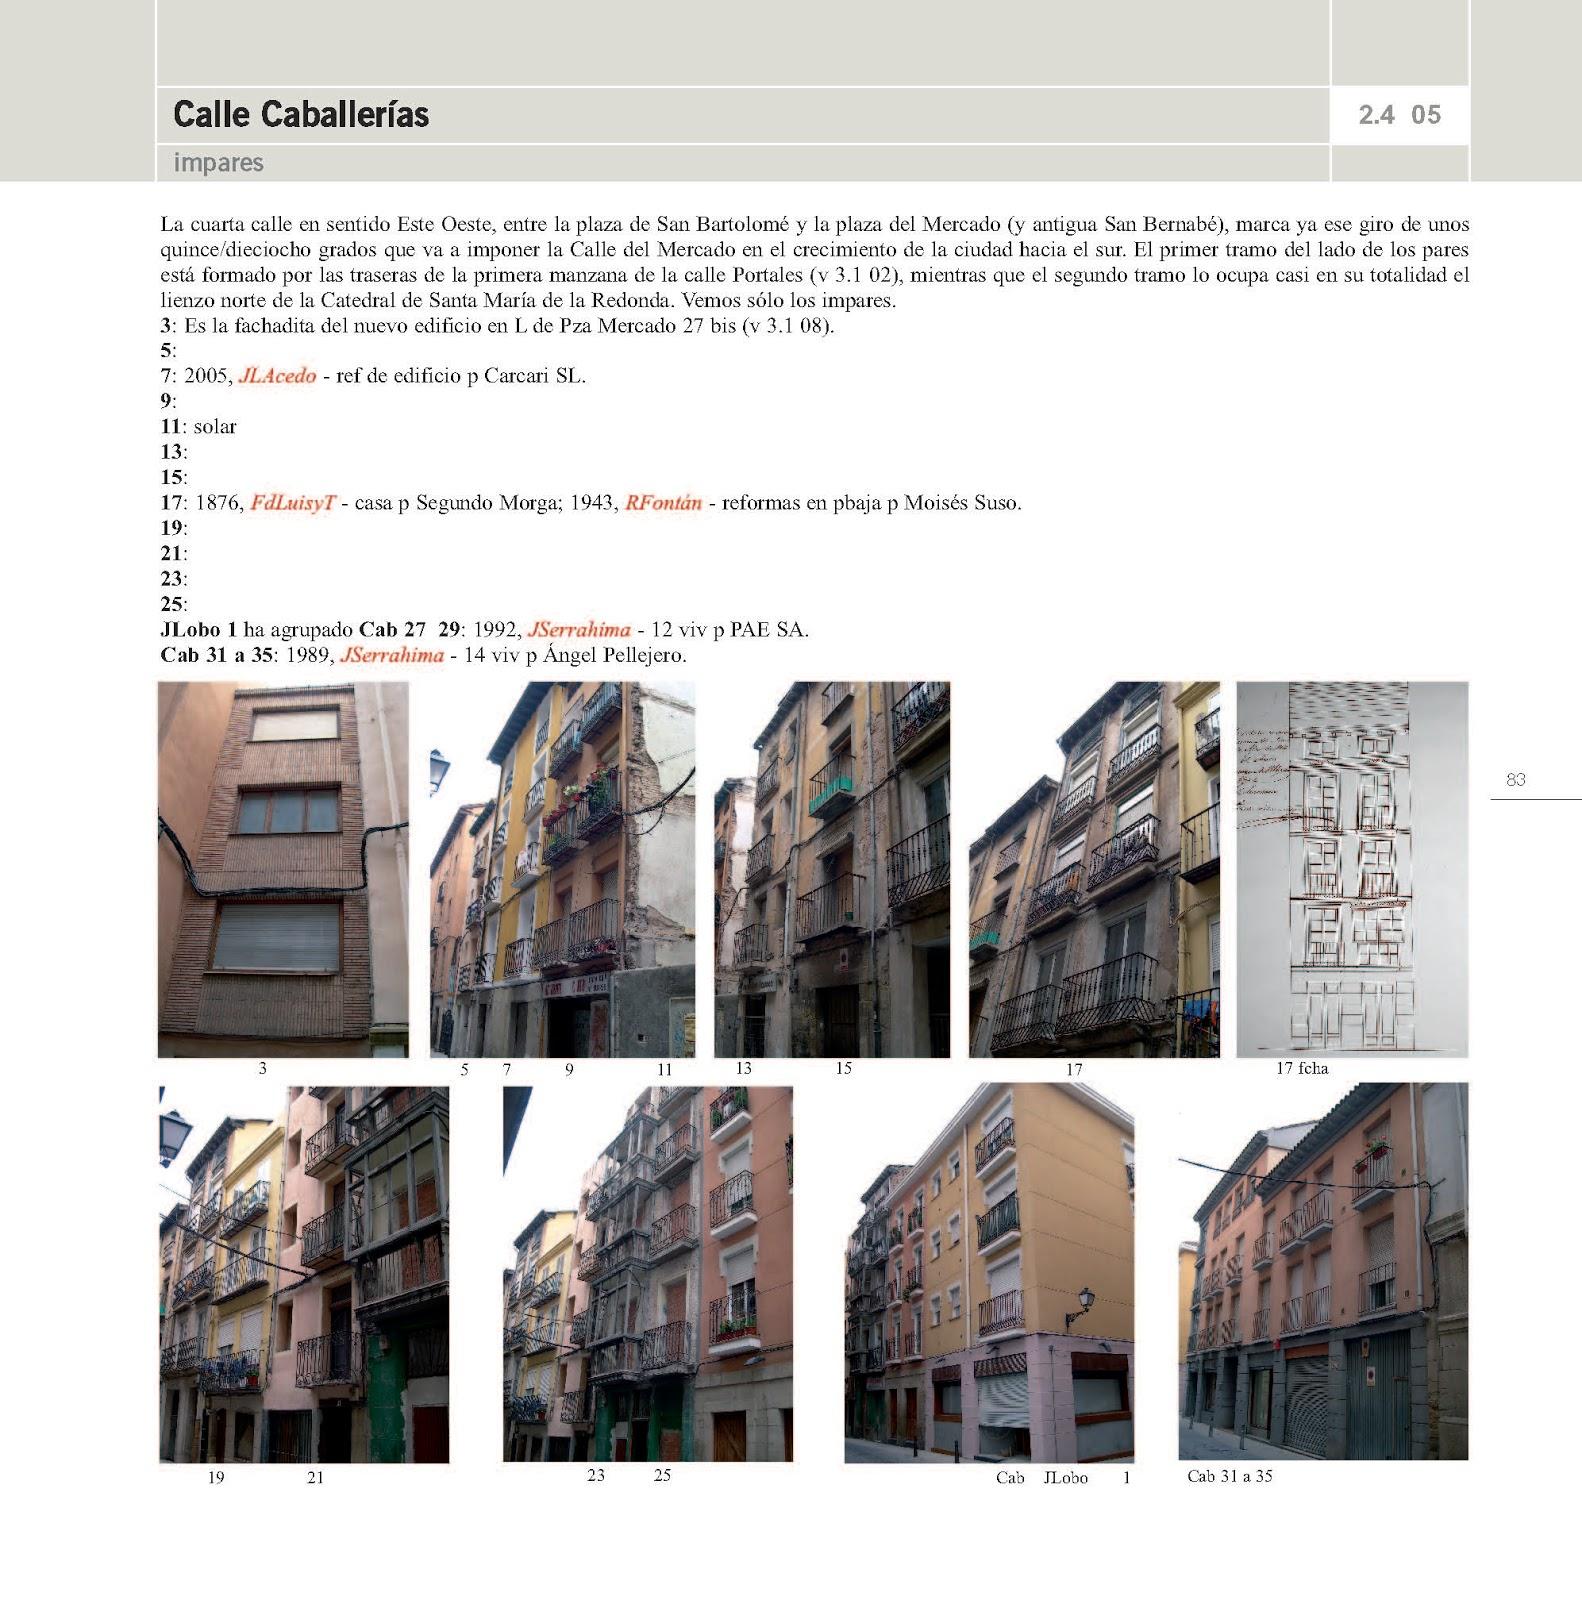 Guia de arquitectura de logro o paginas 2 4 05 calle for Paginas arquitectura